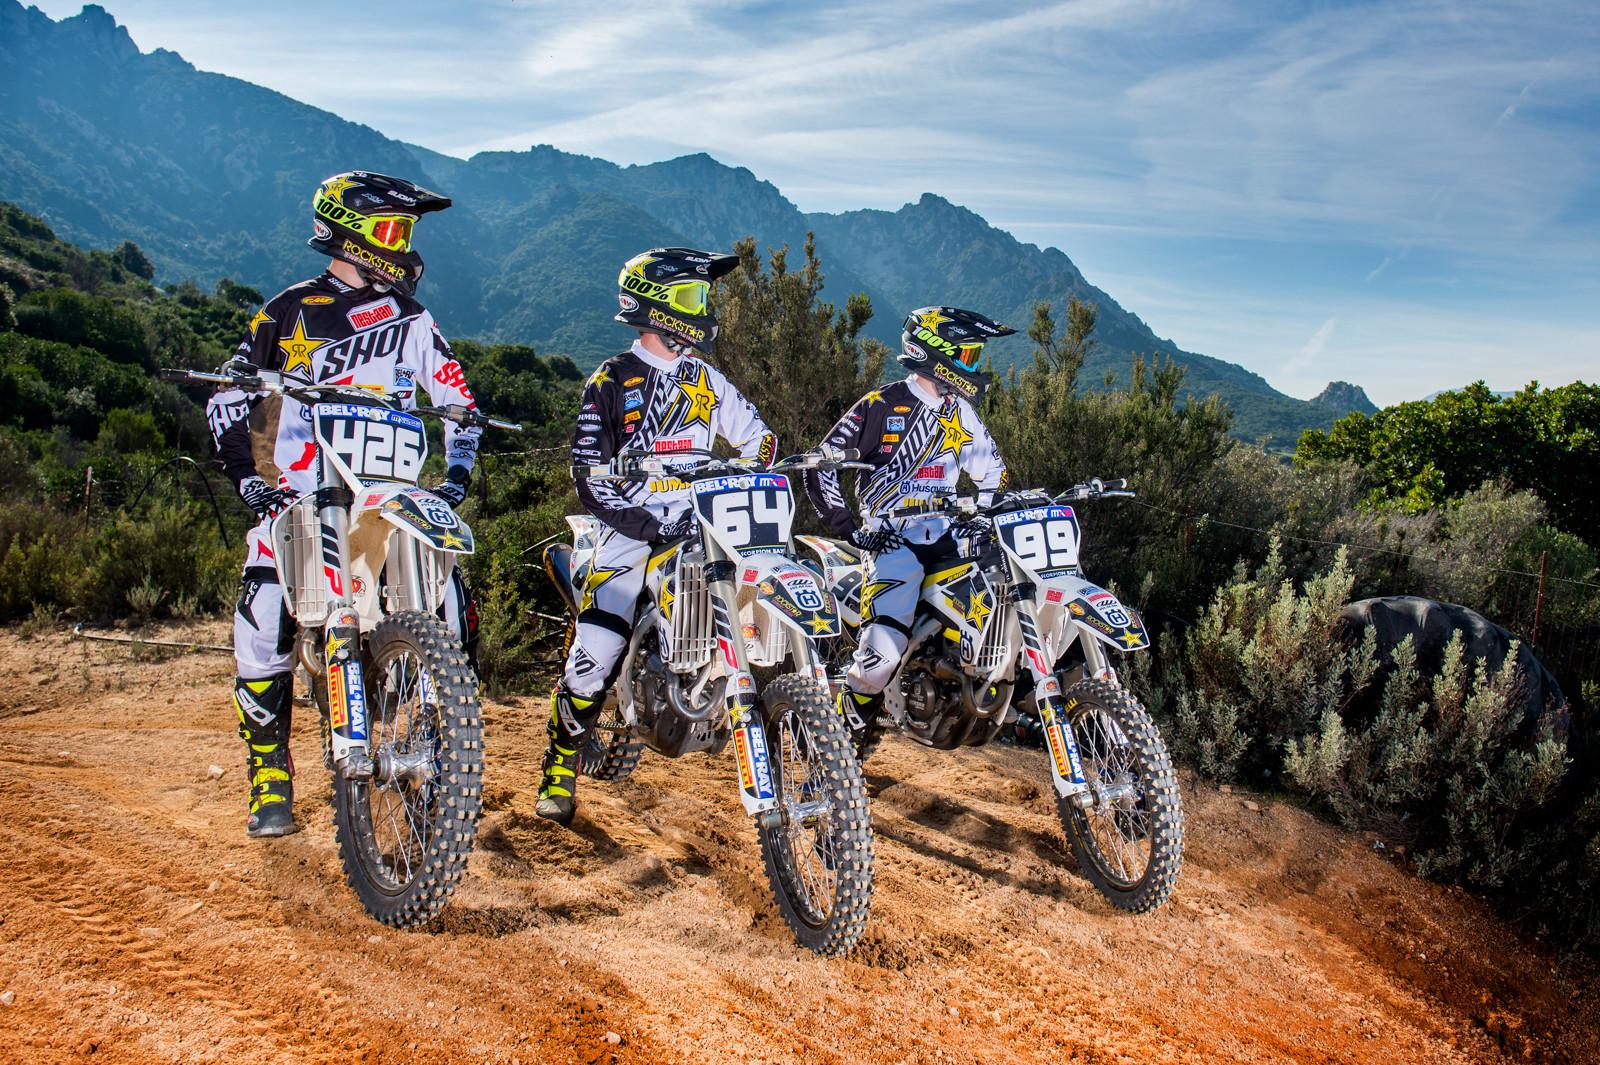 Rockstar Energy Husqvarna Factory Racing MX2 - First Look: Rockstar Energy Husqvarna Factory Racing MX2 - Motocross Pictures - Vital MX